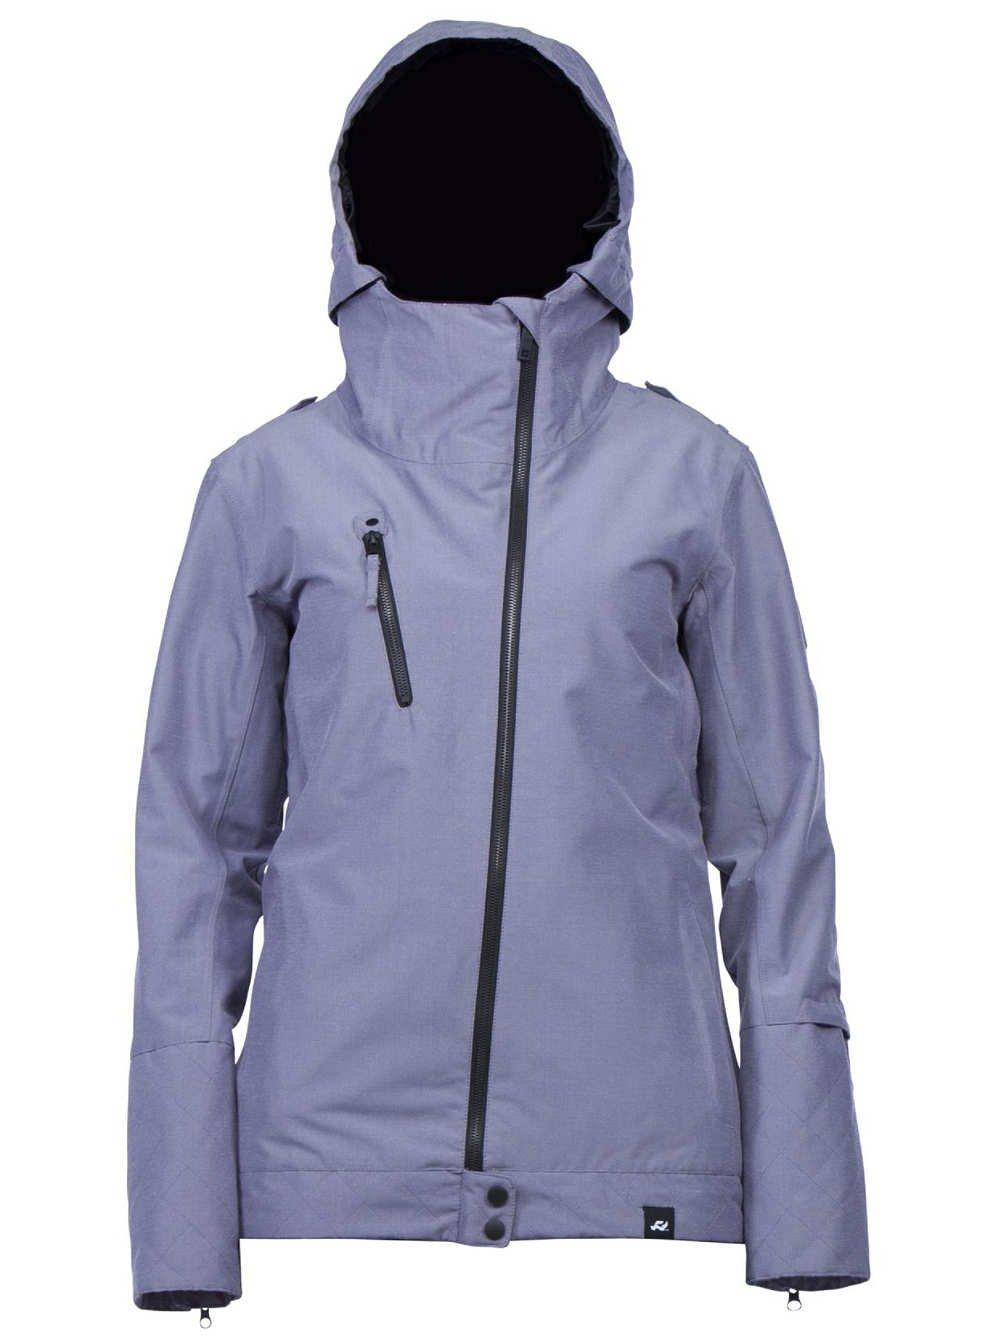 Damen Snowboard Jacke Ride Lenora Jacket kaufen